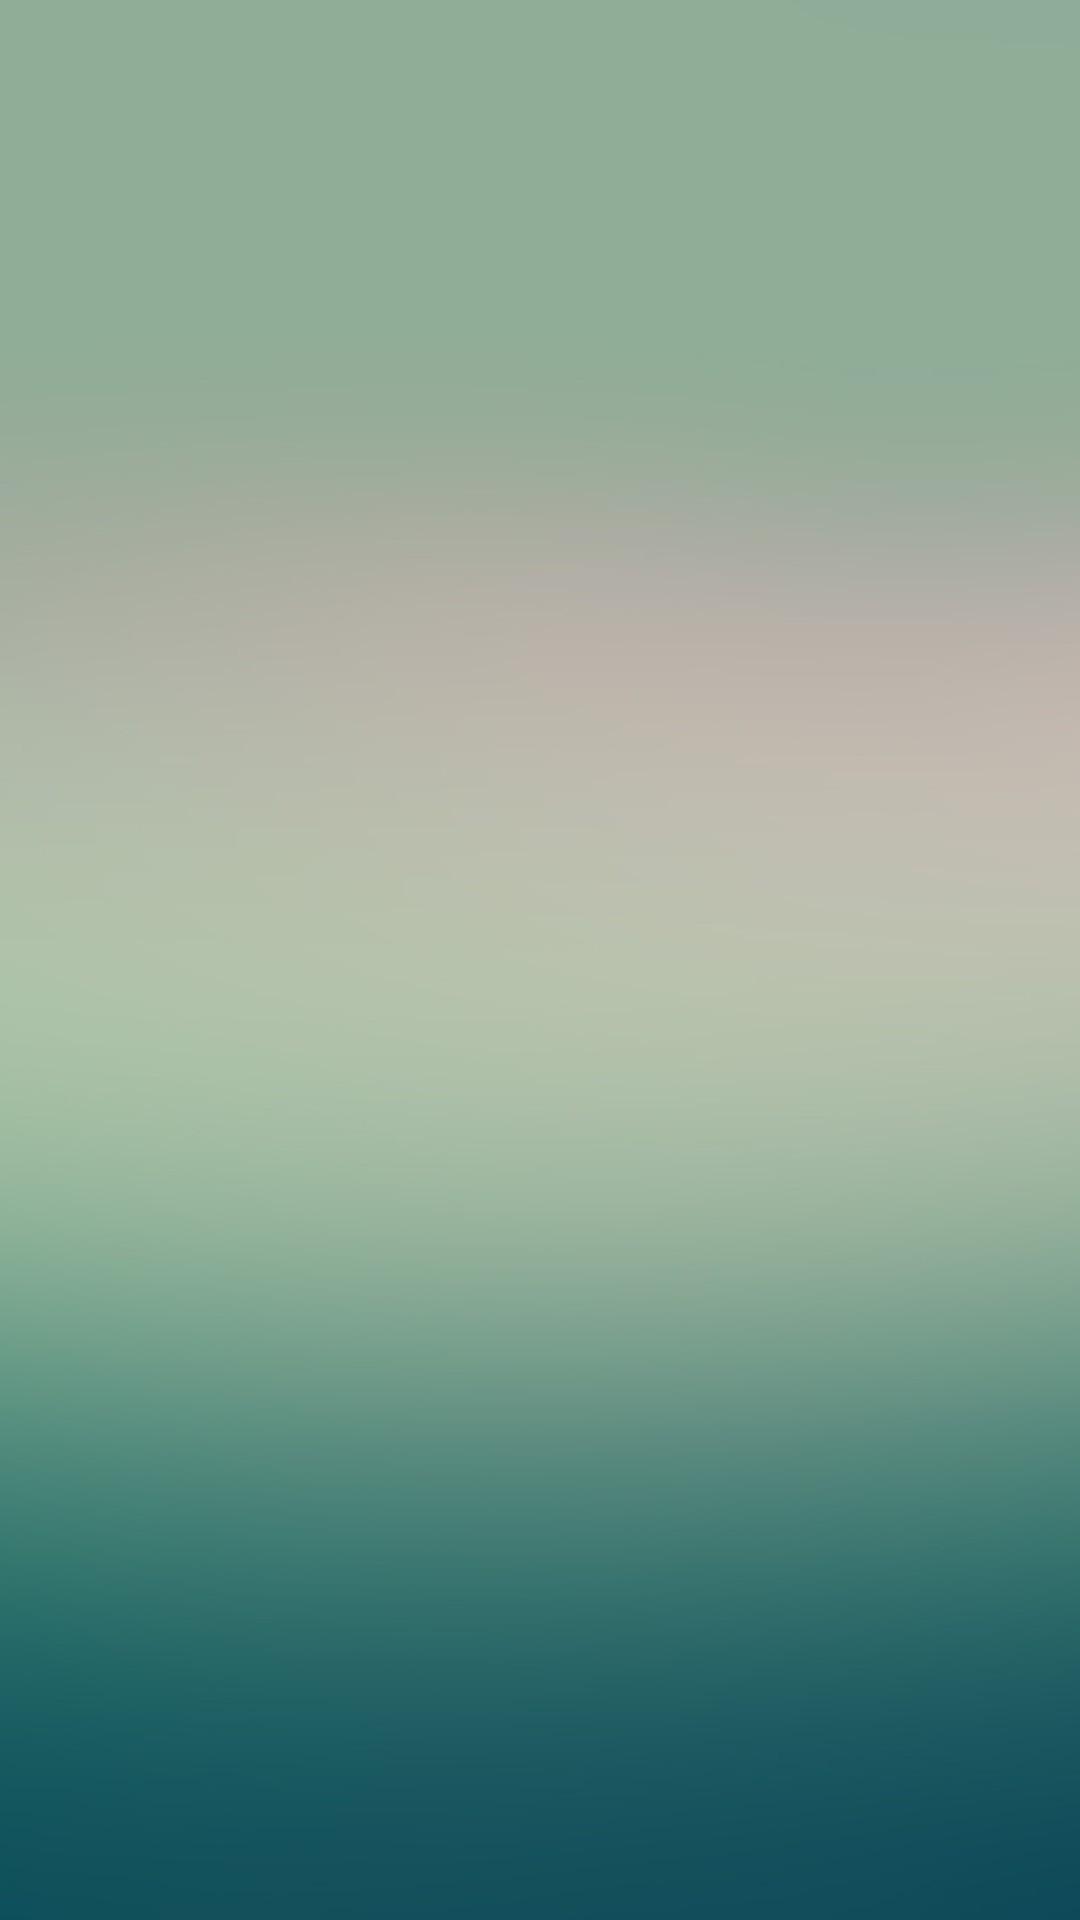 Green Alive Gradation Blur iPhone 6 wallpaper